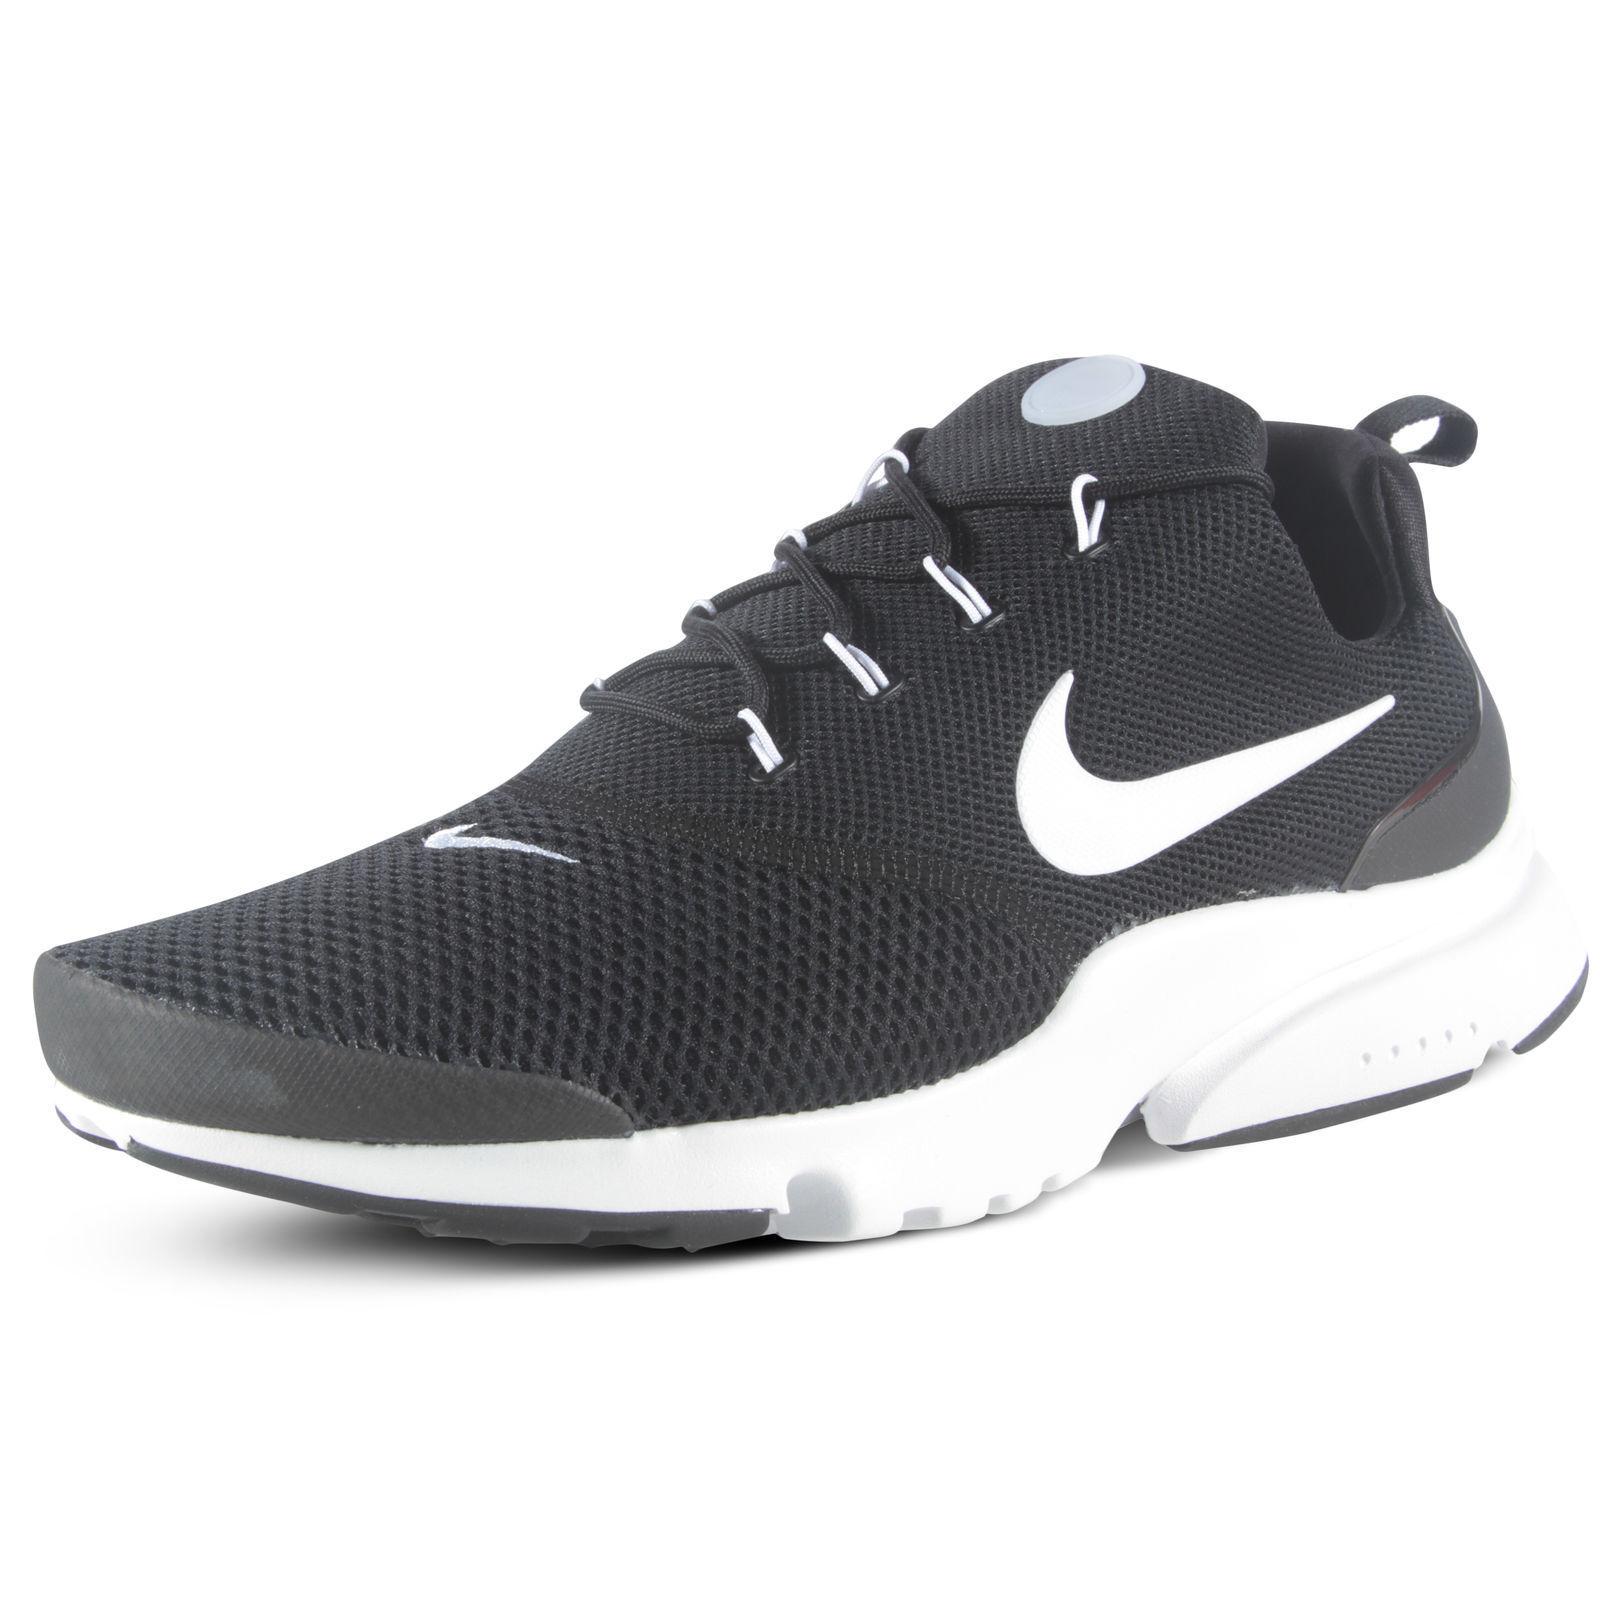 NEW Nike Mens Presto Fly Running shoes Black   Black-White 908019-002 Size 10.5